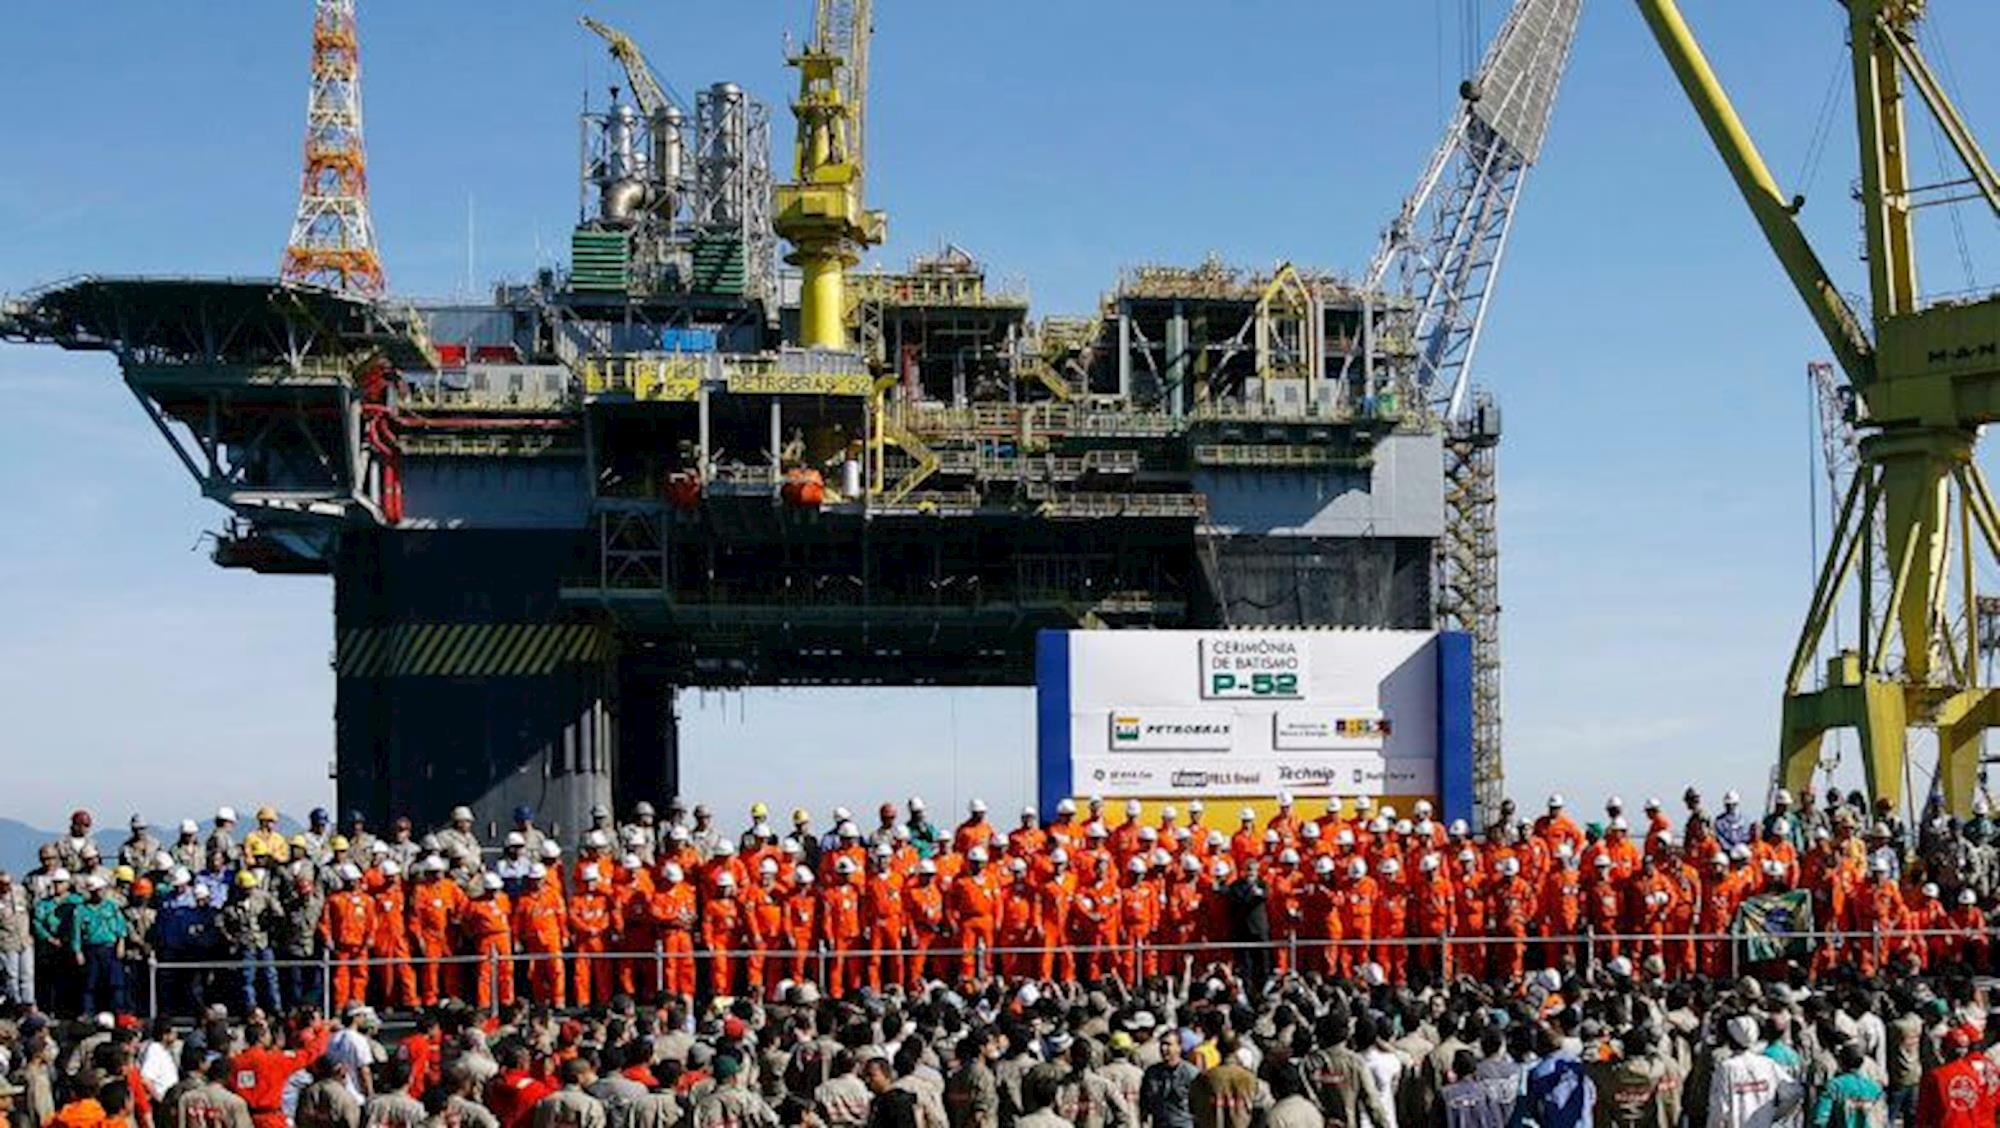 Petrobras, emprego, sorocaba, demissões, bardella, jaraguá, metso, golpistas, Wikicommons